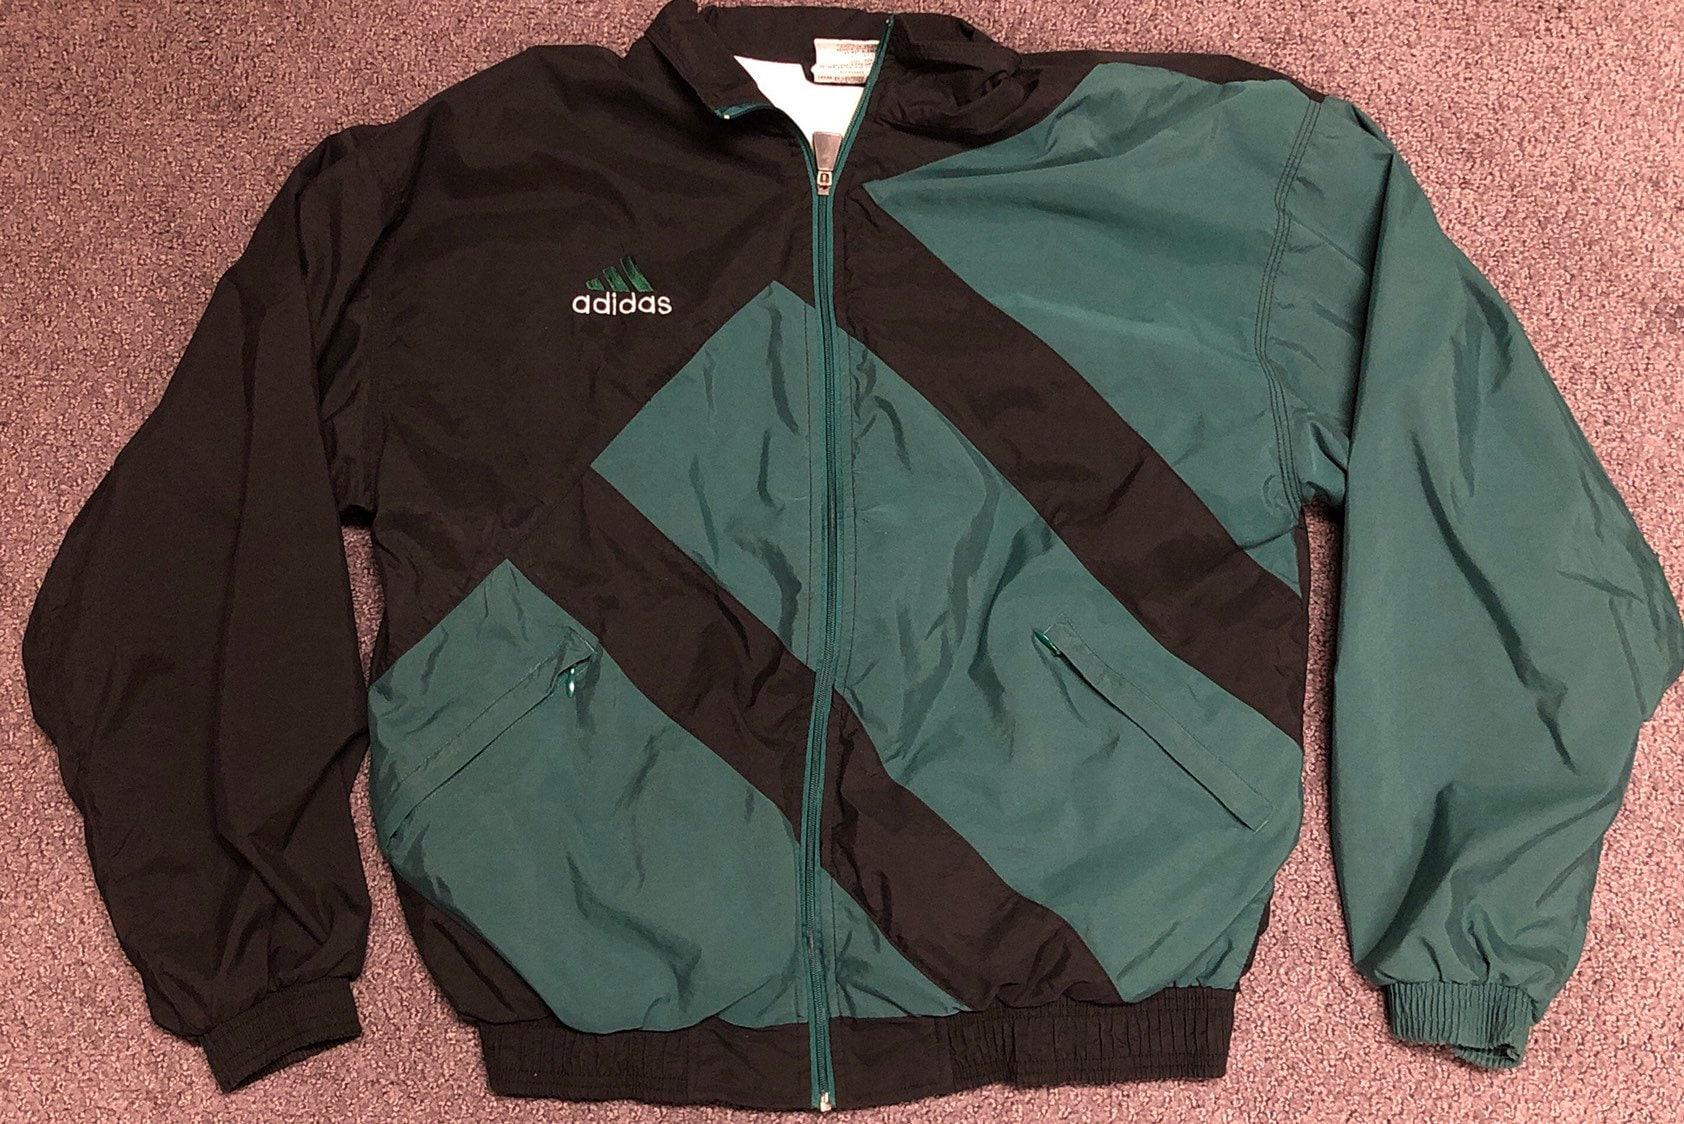 3bc98e3f1f616 Adidas Vintage 90s Pine Green Big Logo Full Zip Track Jacket Mens Medium